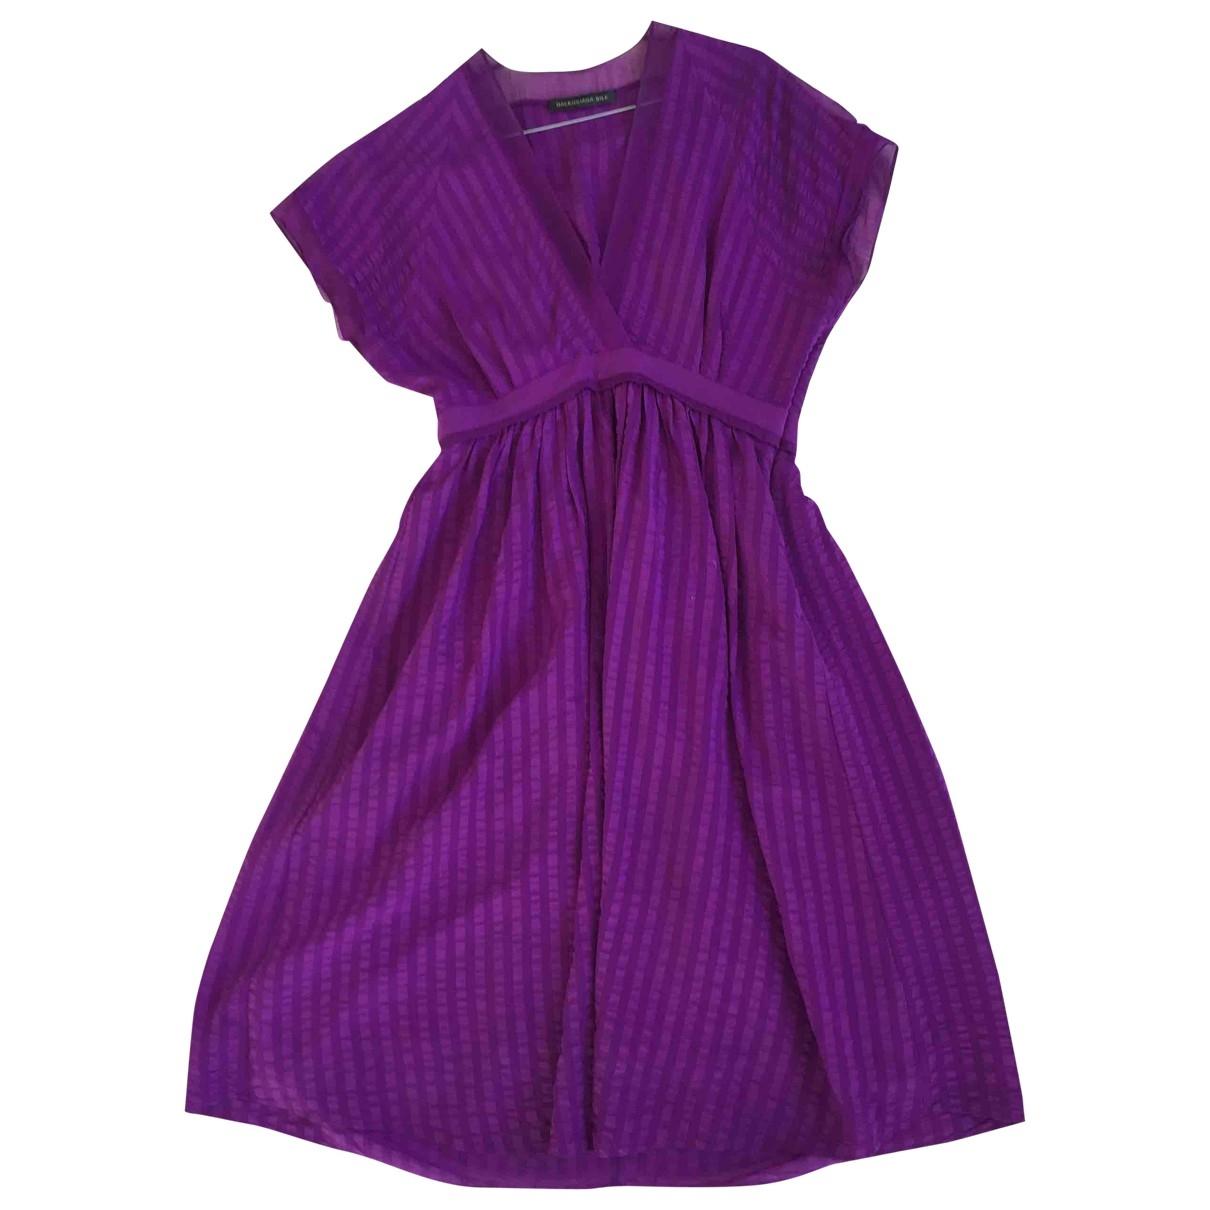 Givenchy \N Kleid in  Lila Seide